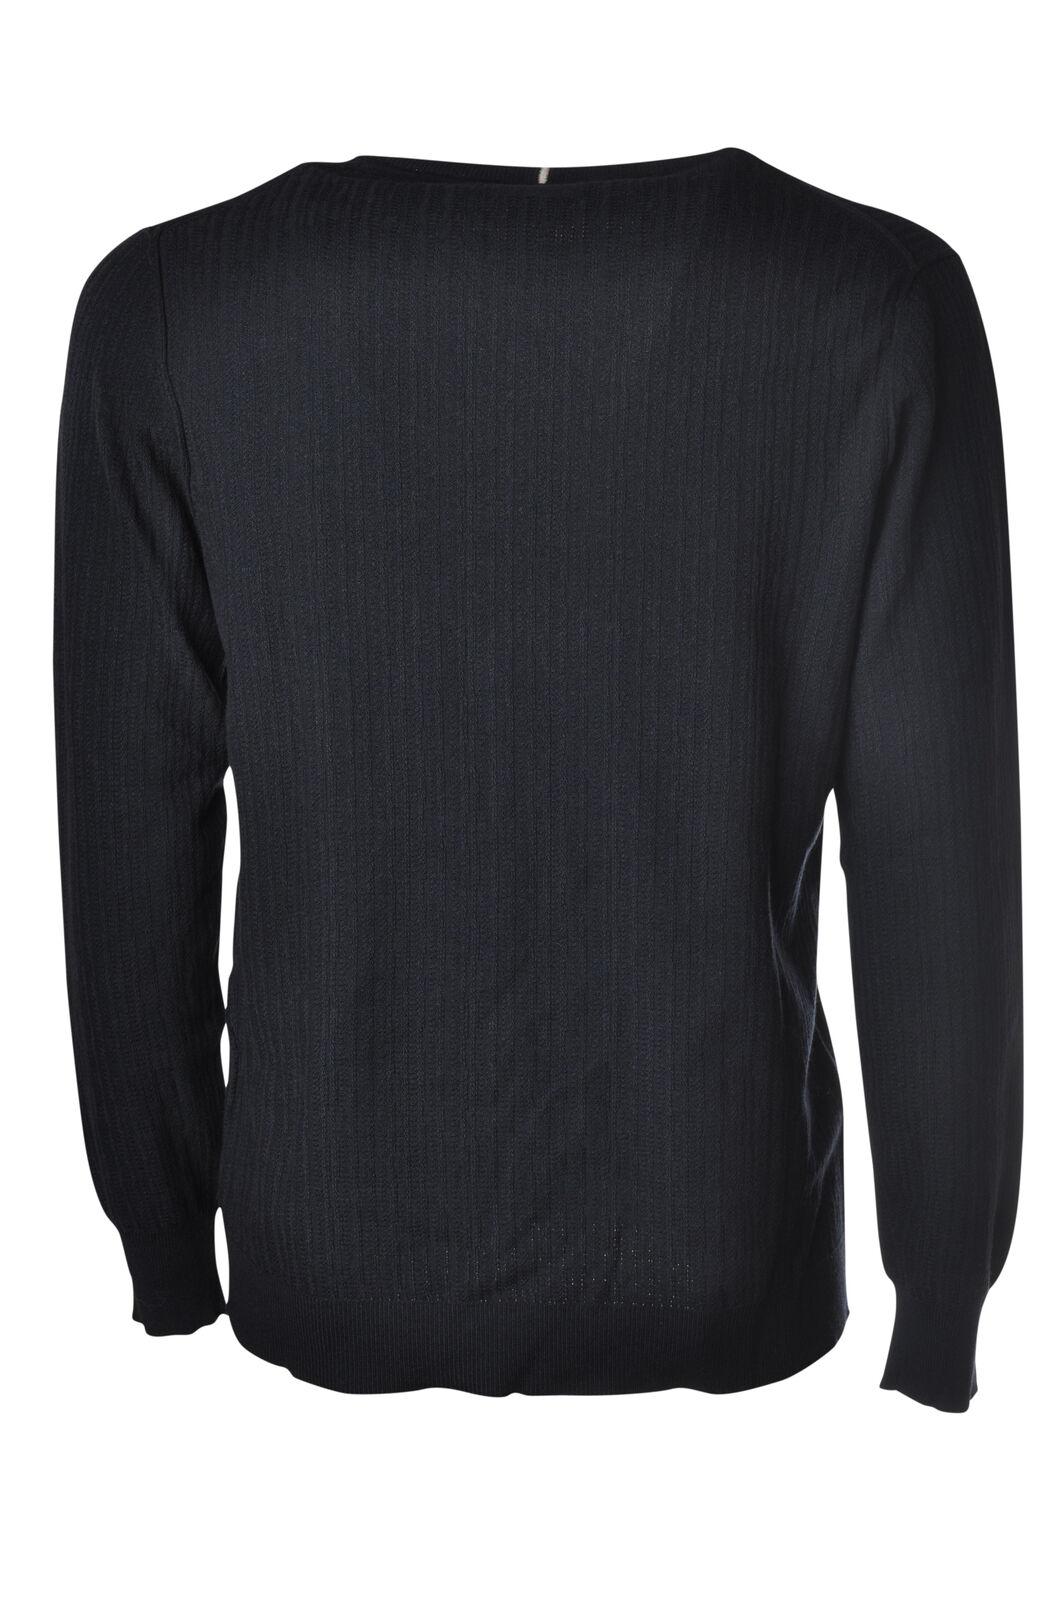 Supreme  Sweats & Hoodies 460539  460539 Hoodies bianca L 248b98